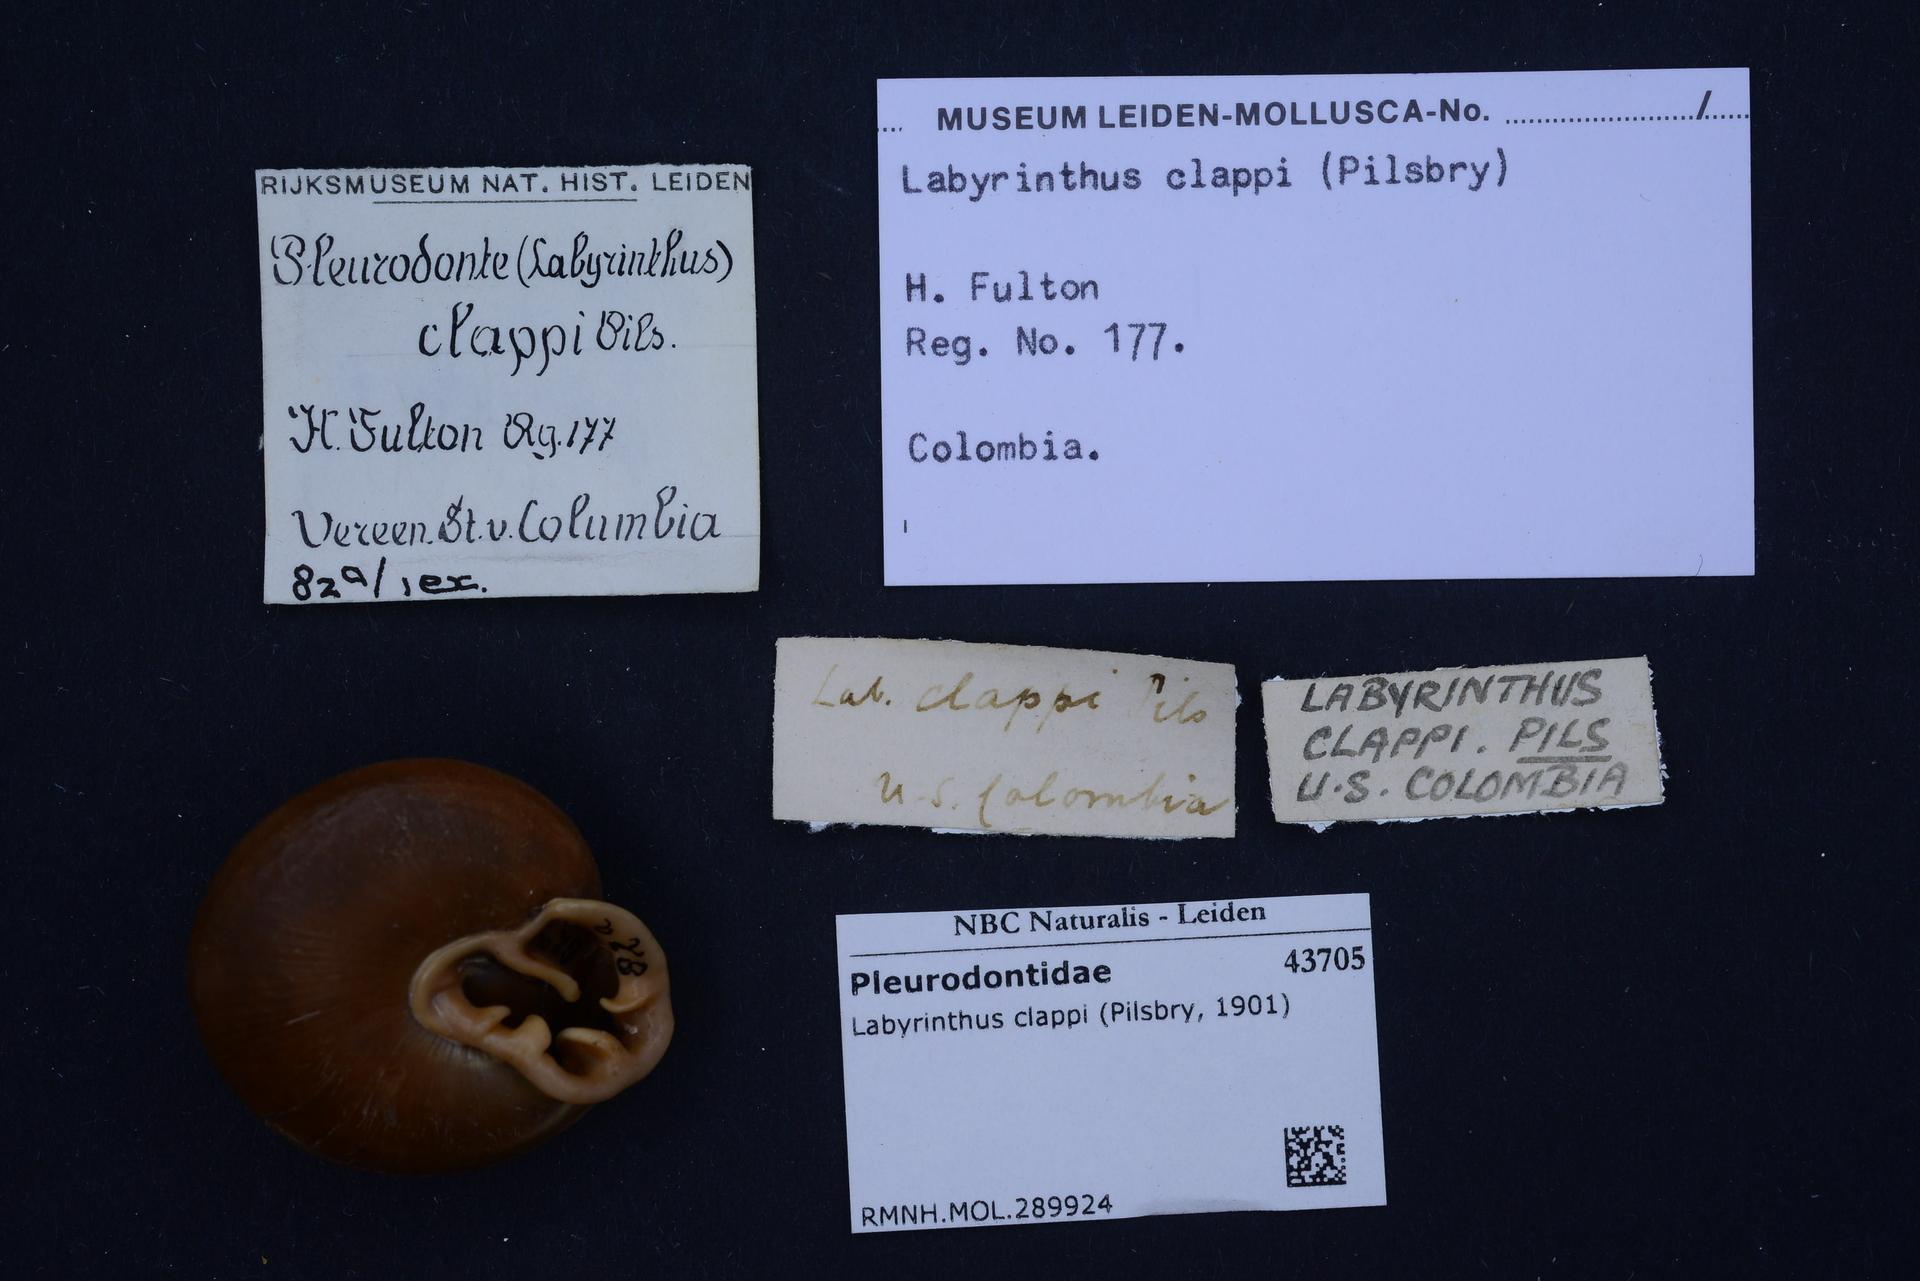 File:Naturalis Biodiversity Center - RMNH MOL 289924